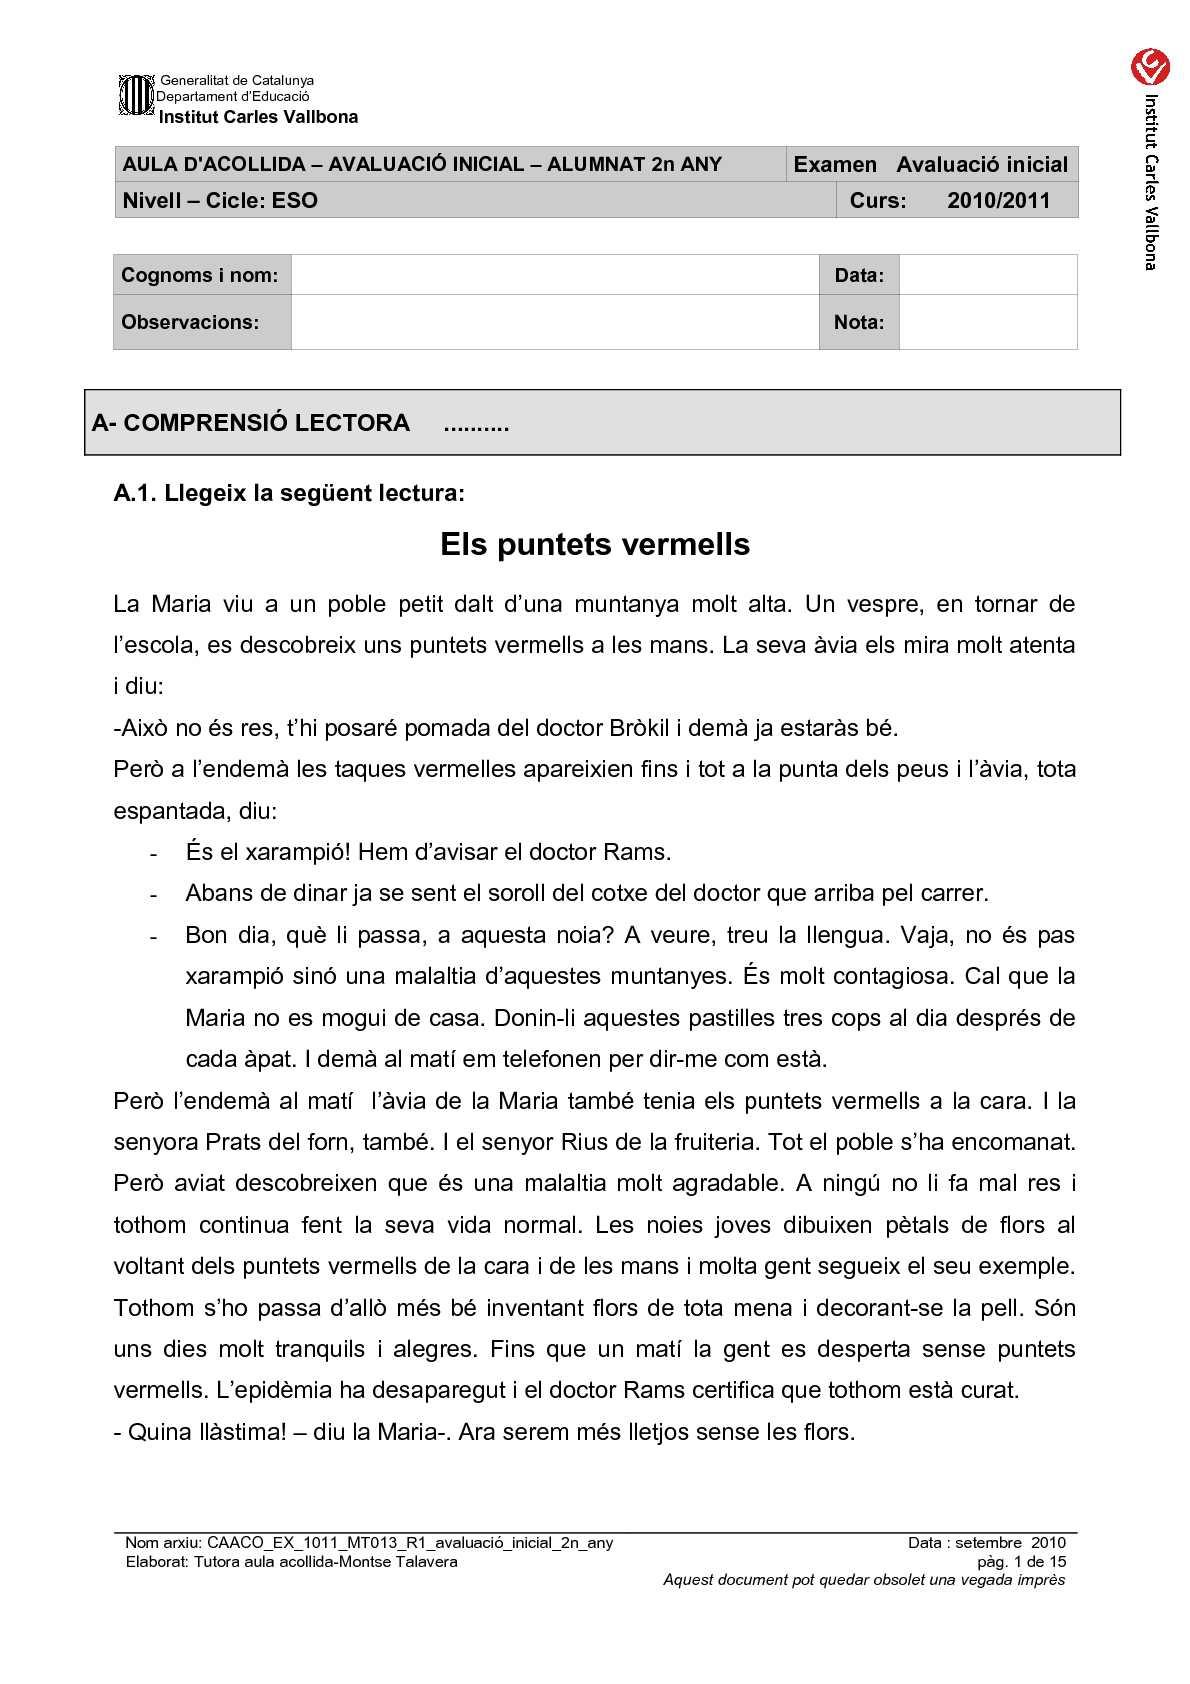 AVALUACIÓ INICIAL AULA ACOLLIDA - 2n ANY